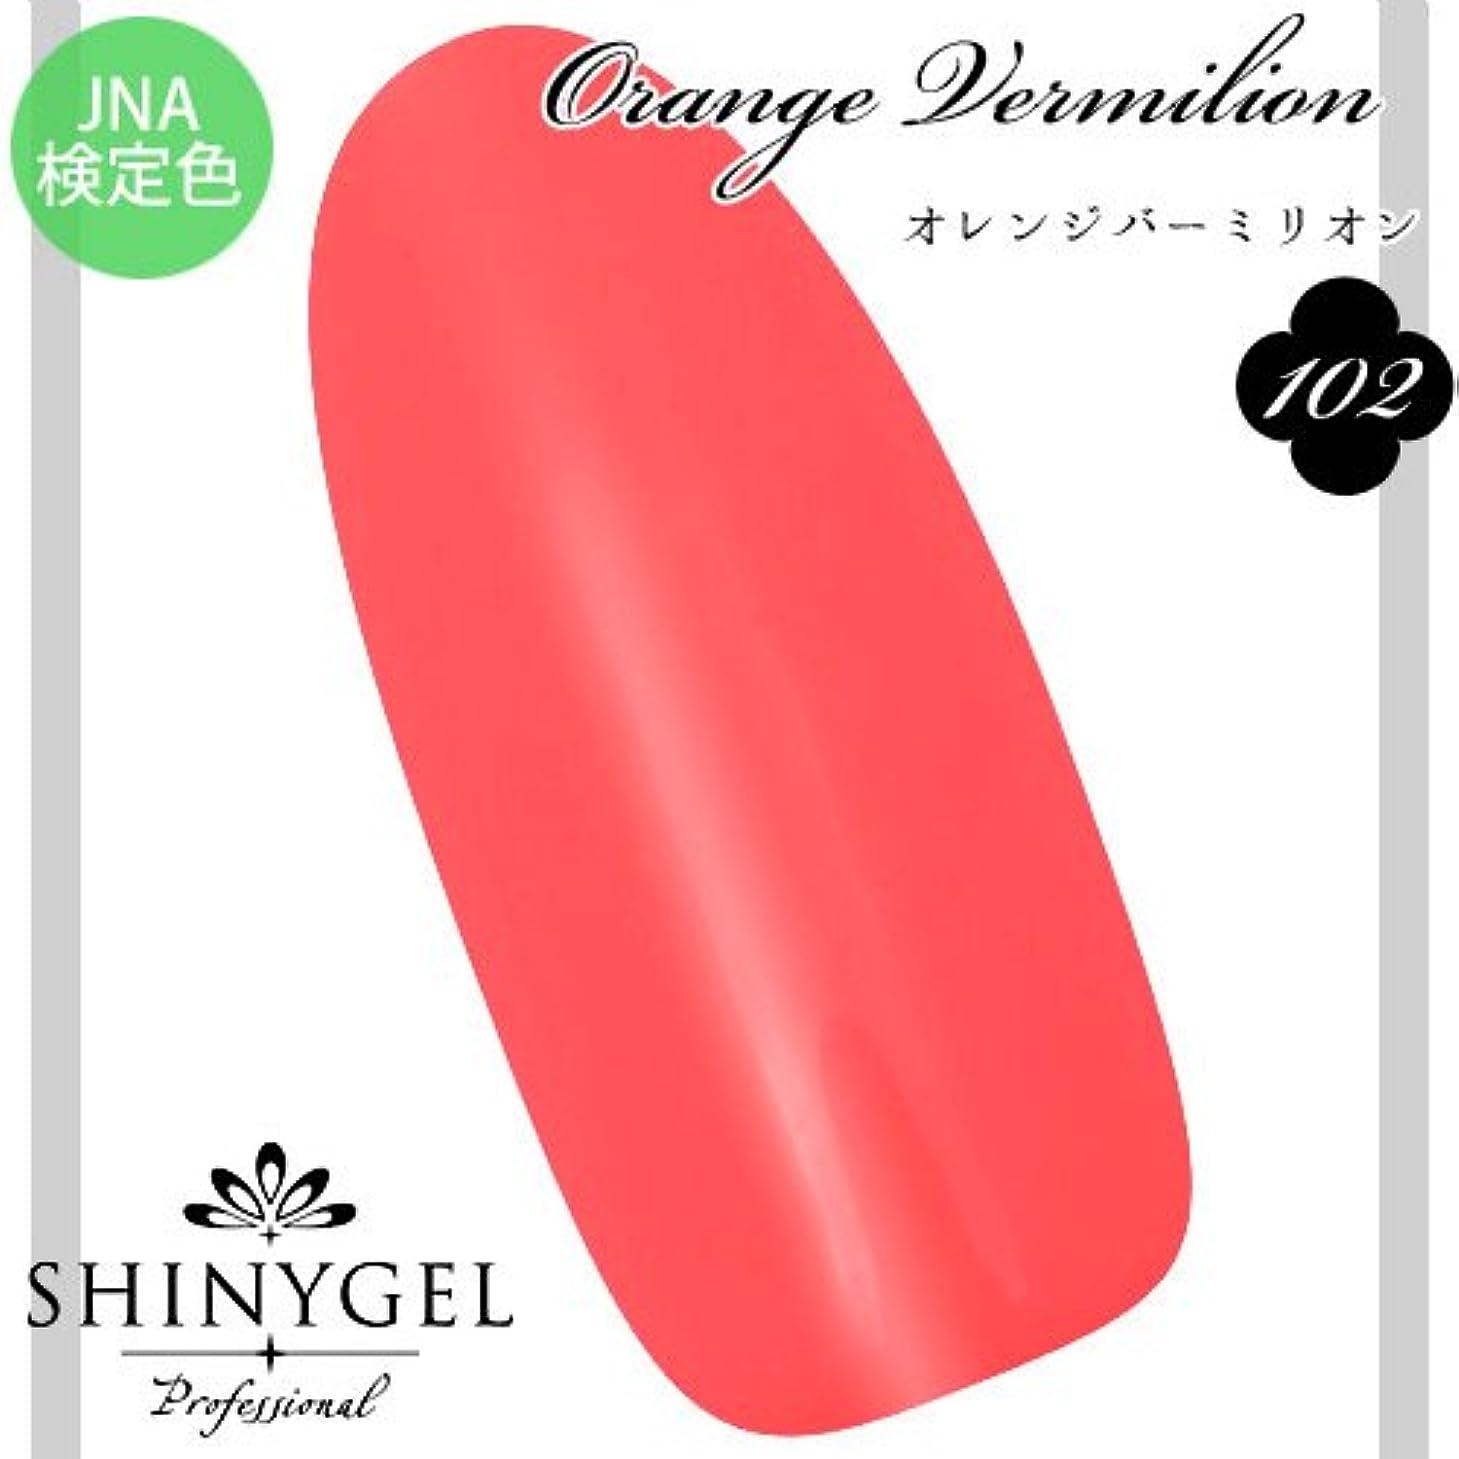 SHINY GEL カラージェル 102 4g オレンジバーミリオン JNA検定色 UV/LED対応